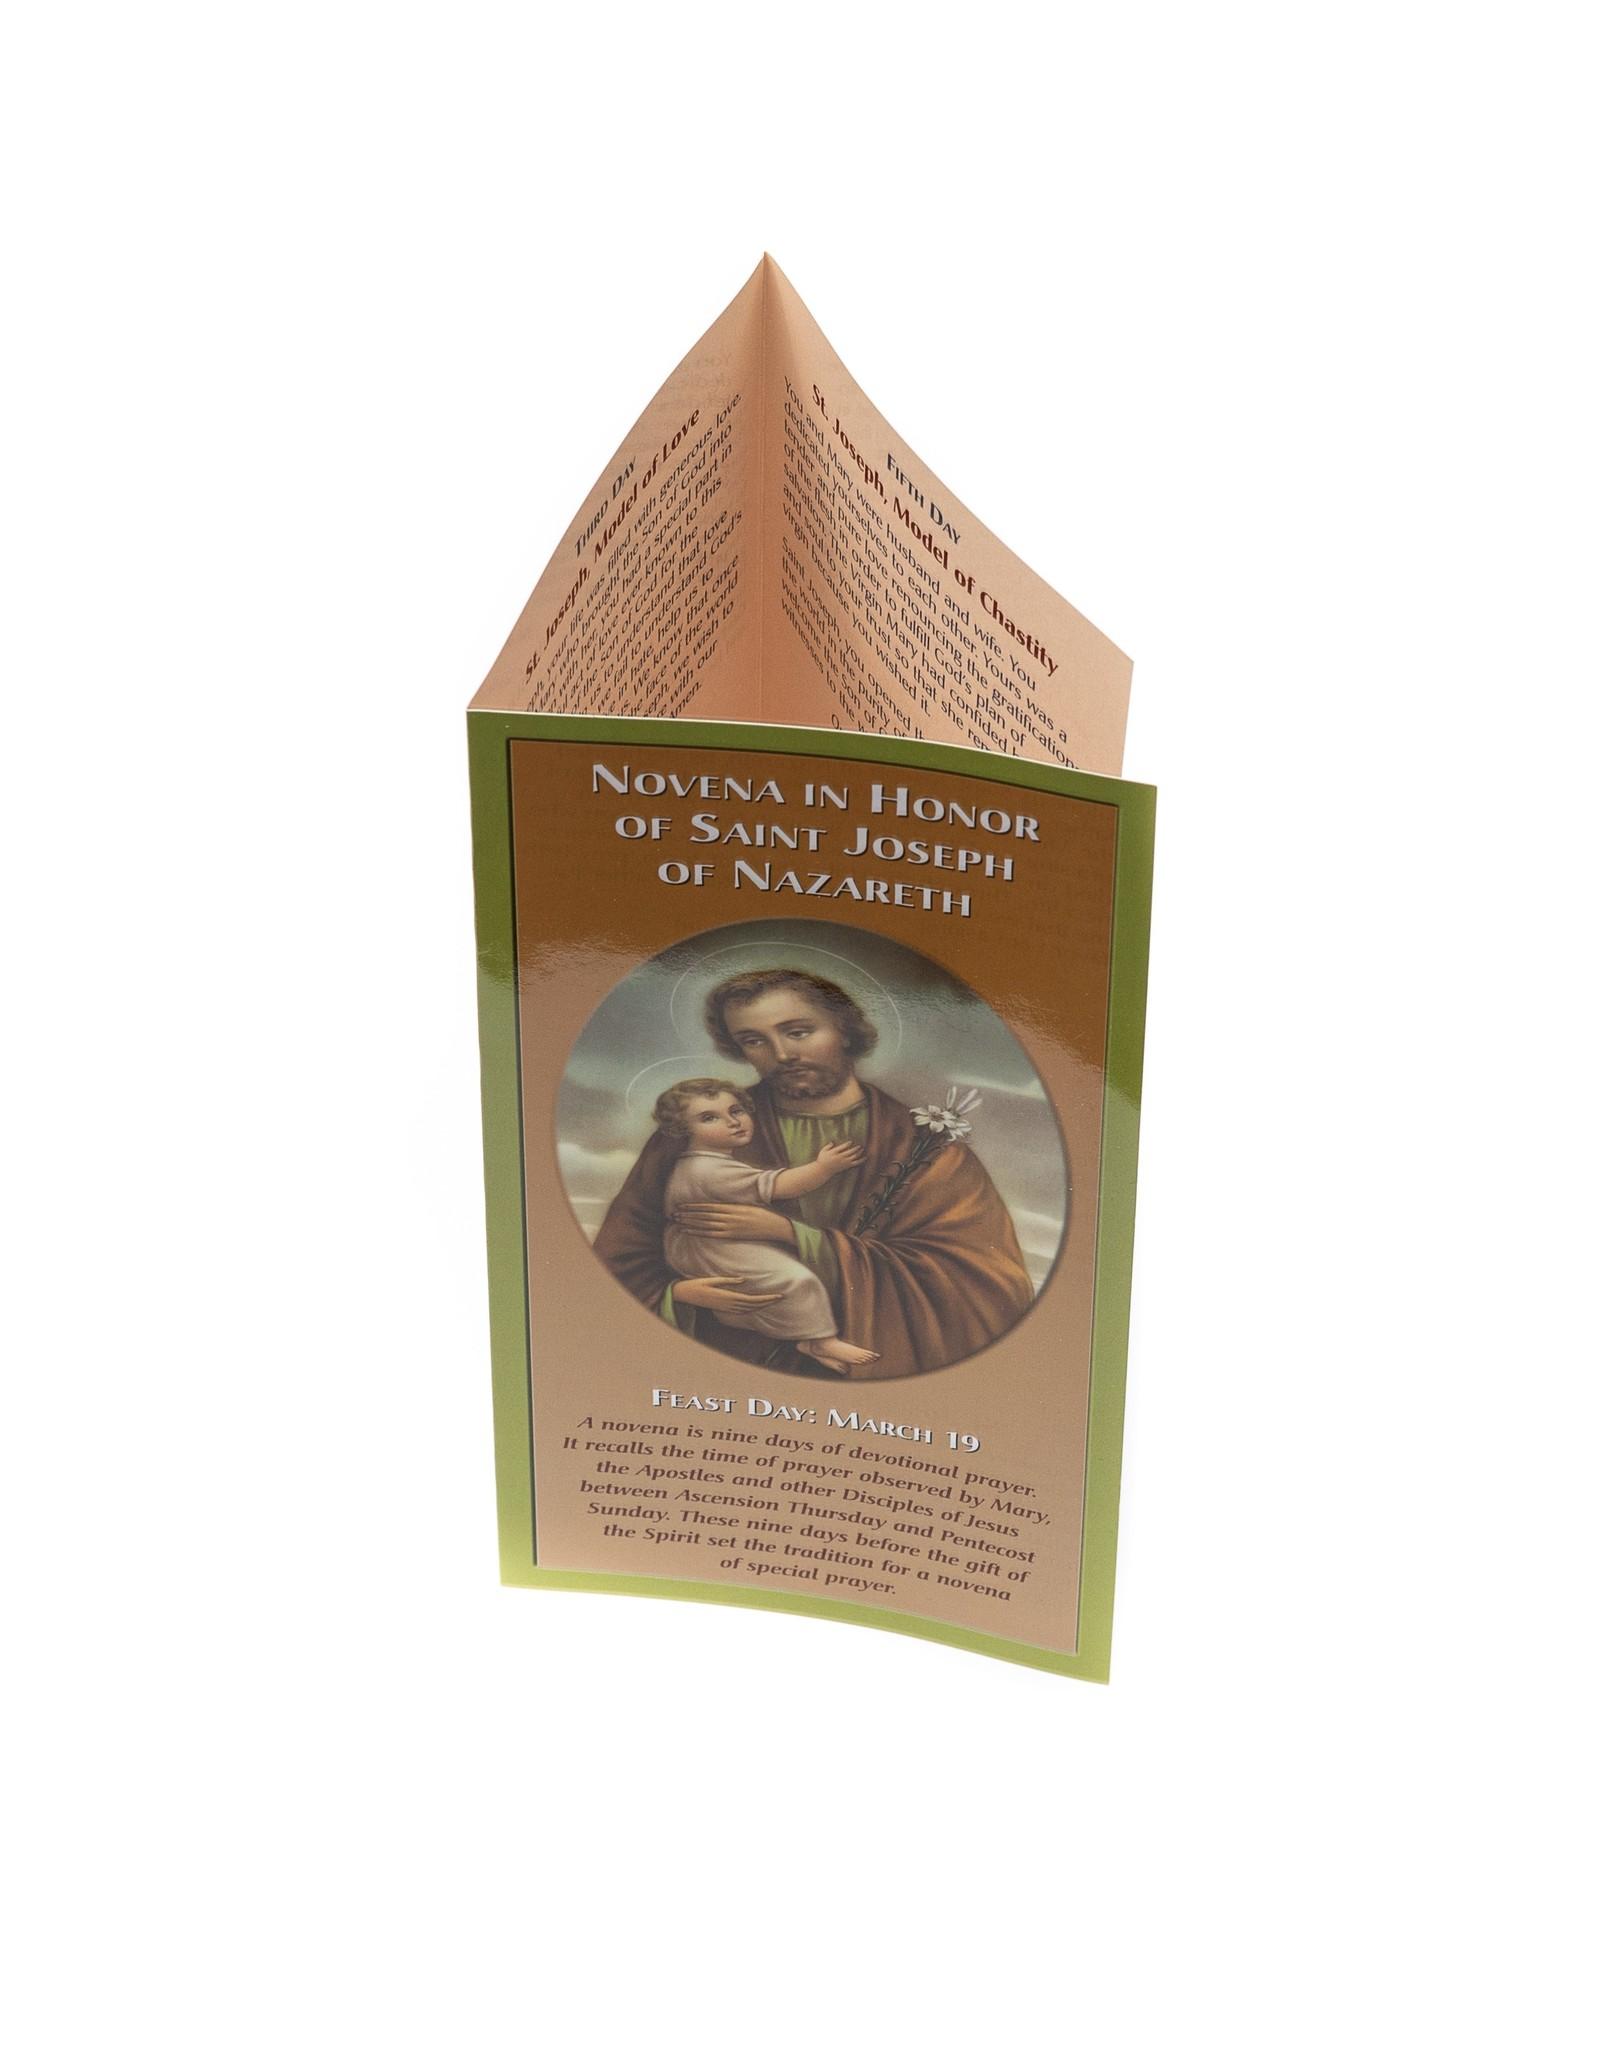 Novena in Honor of Saint Joseph of Nazareth (leaflet)